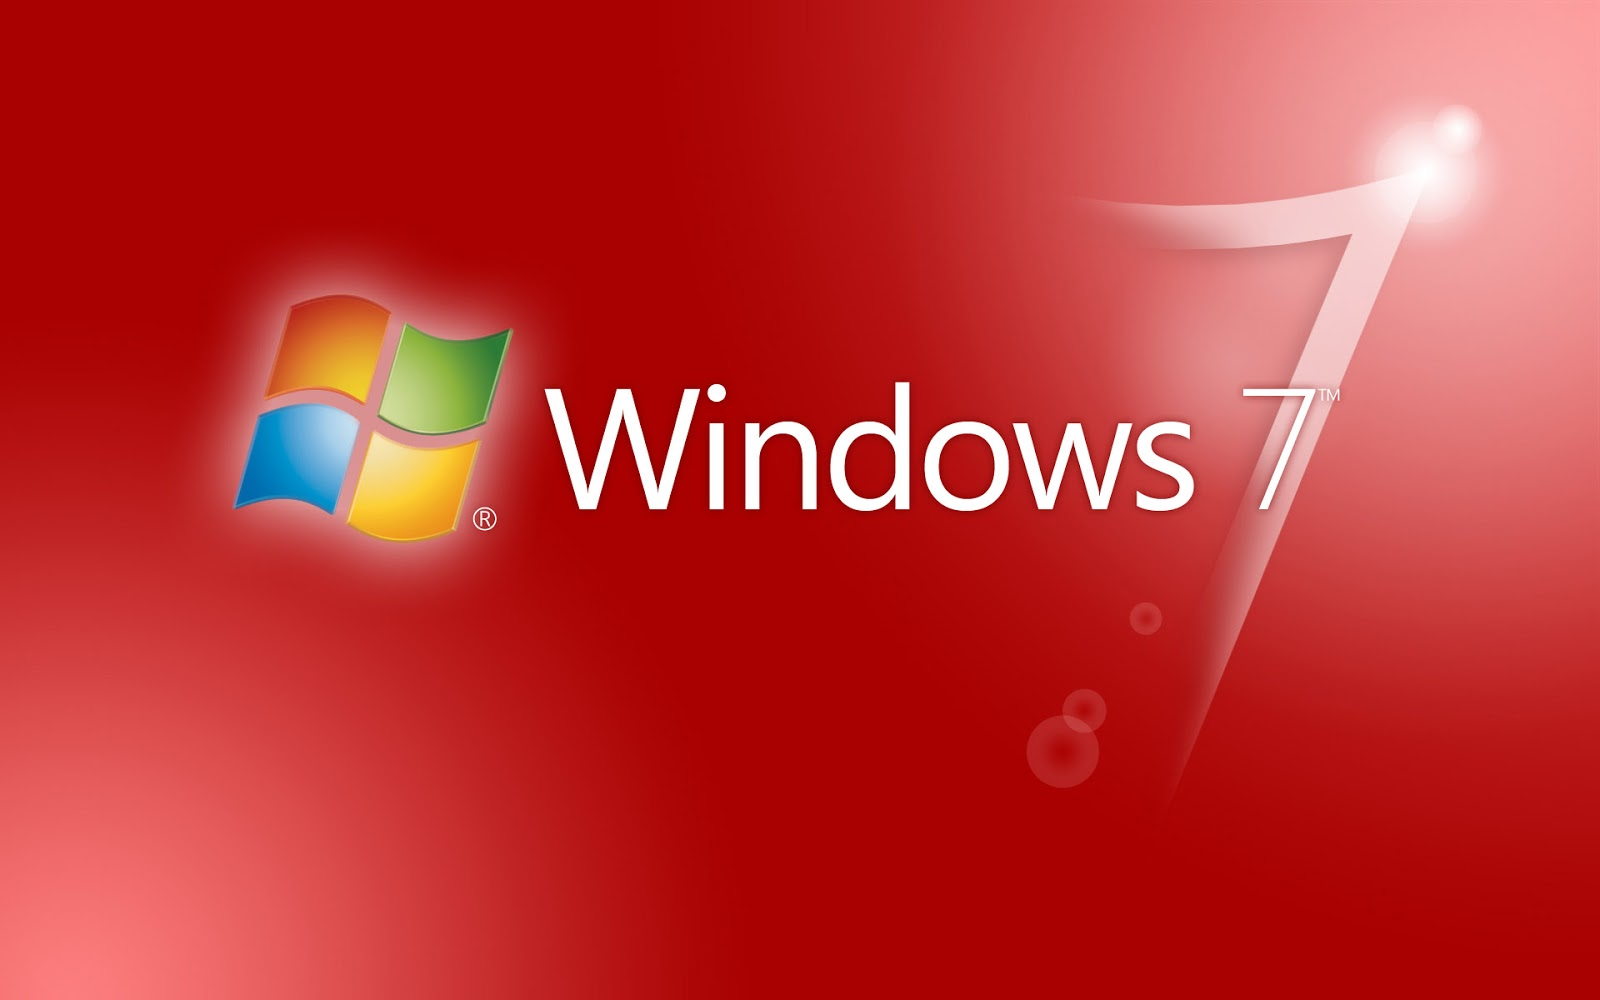 http://4.bp.blogspot.com/-mUHmvQVBKN8/USxMRO7lKXI/AAAAAAAADQo/Cye45vXfdLg/s1600/Windows%2B7%2BWidescreen%2BWallpaper%2B8.jpg